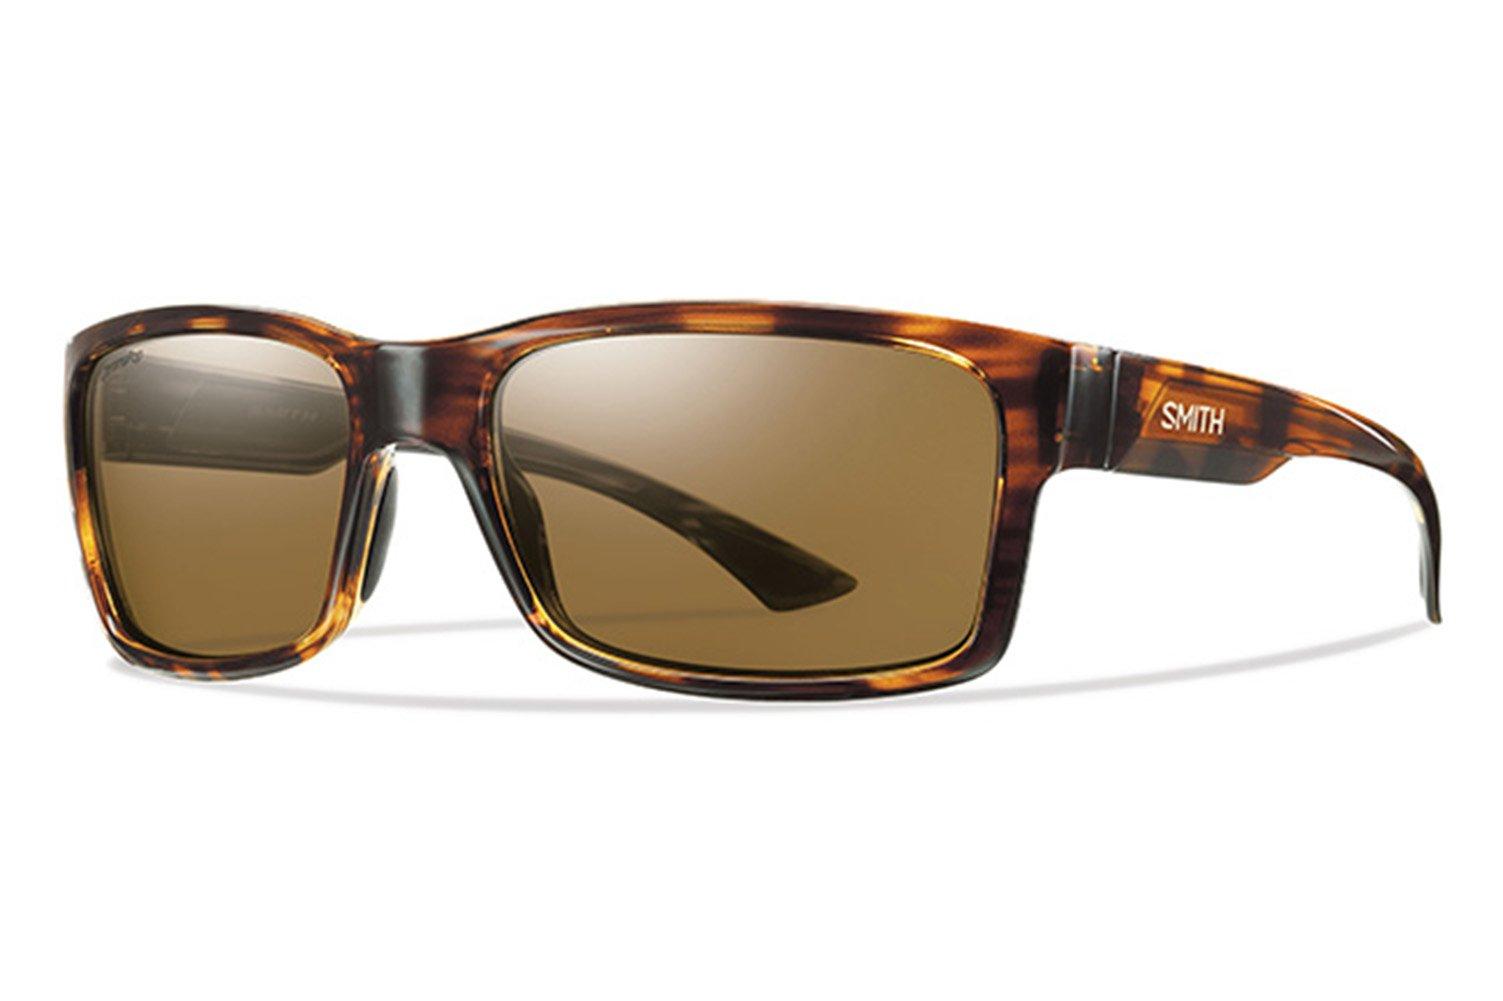 Smith Dolen Sunglasses by Smith Optics